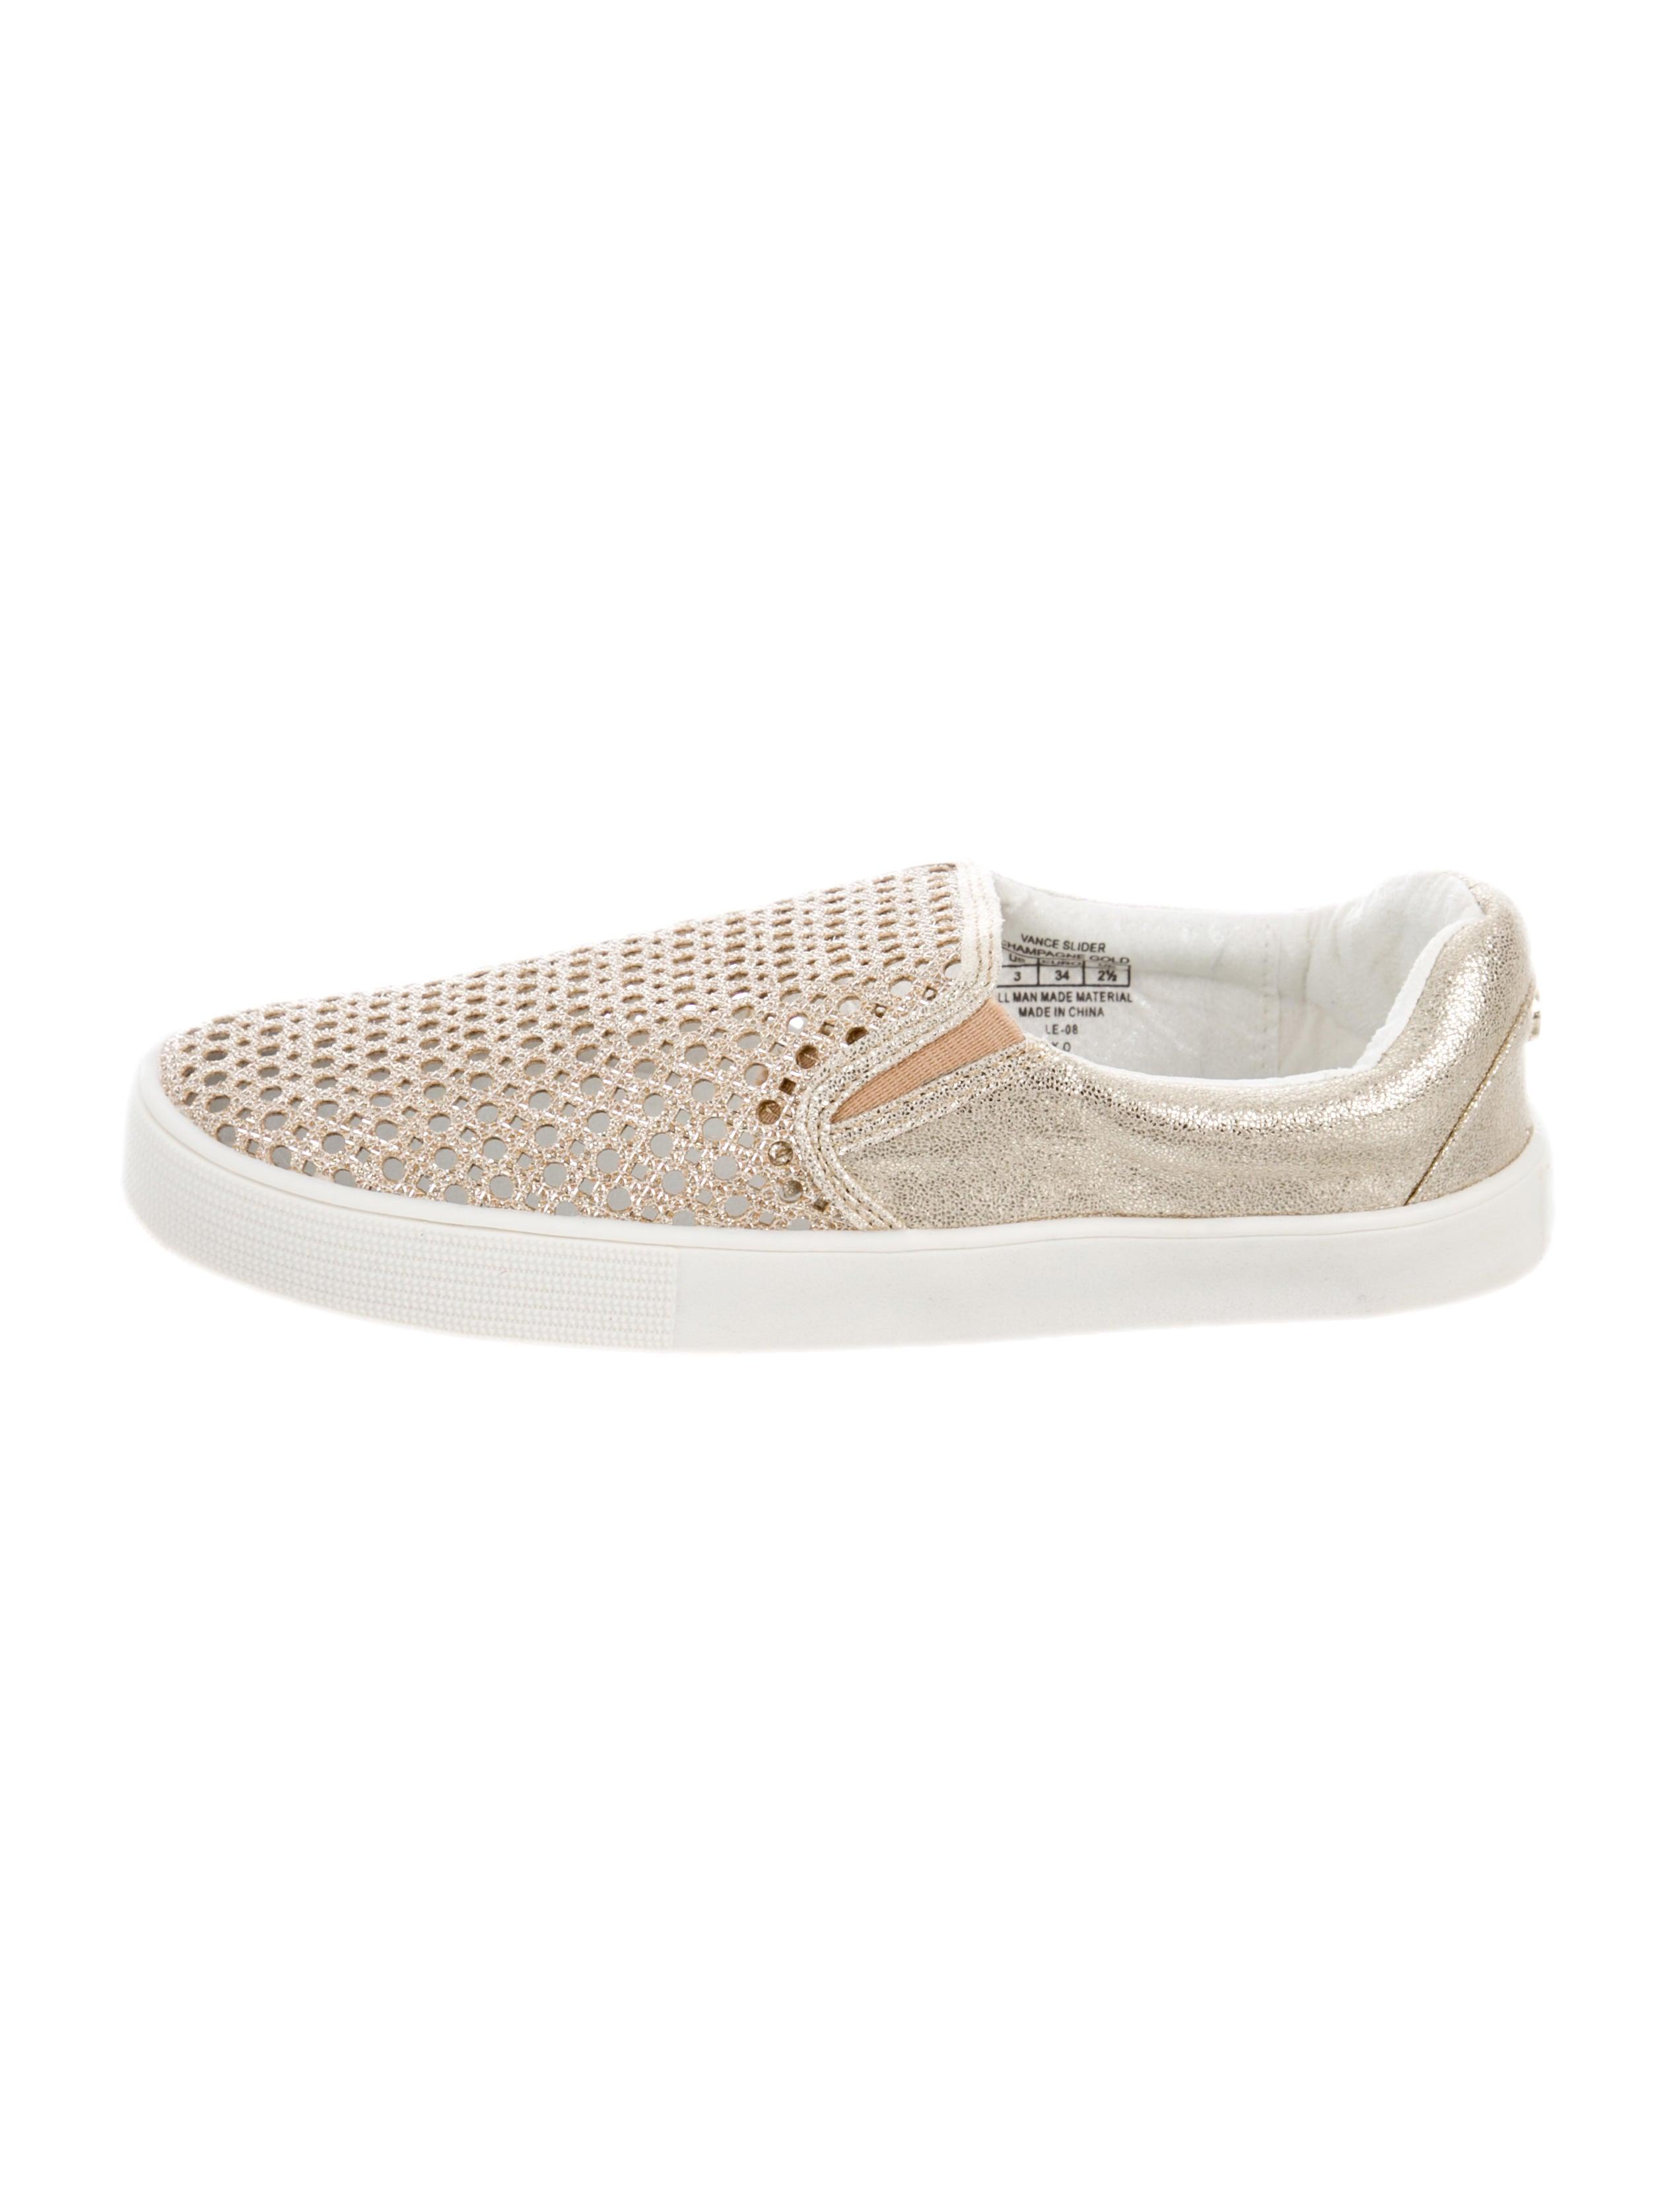 2bbc1687e7f093 Stuart Weitzman Girls  Vance Slip-On Sneakers - Girls - WSU58320 ...